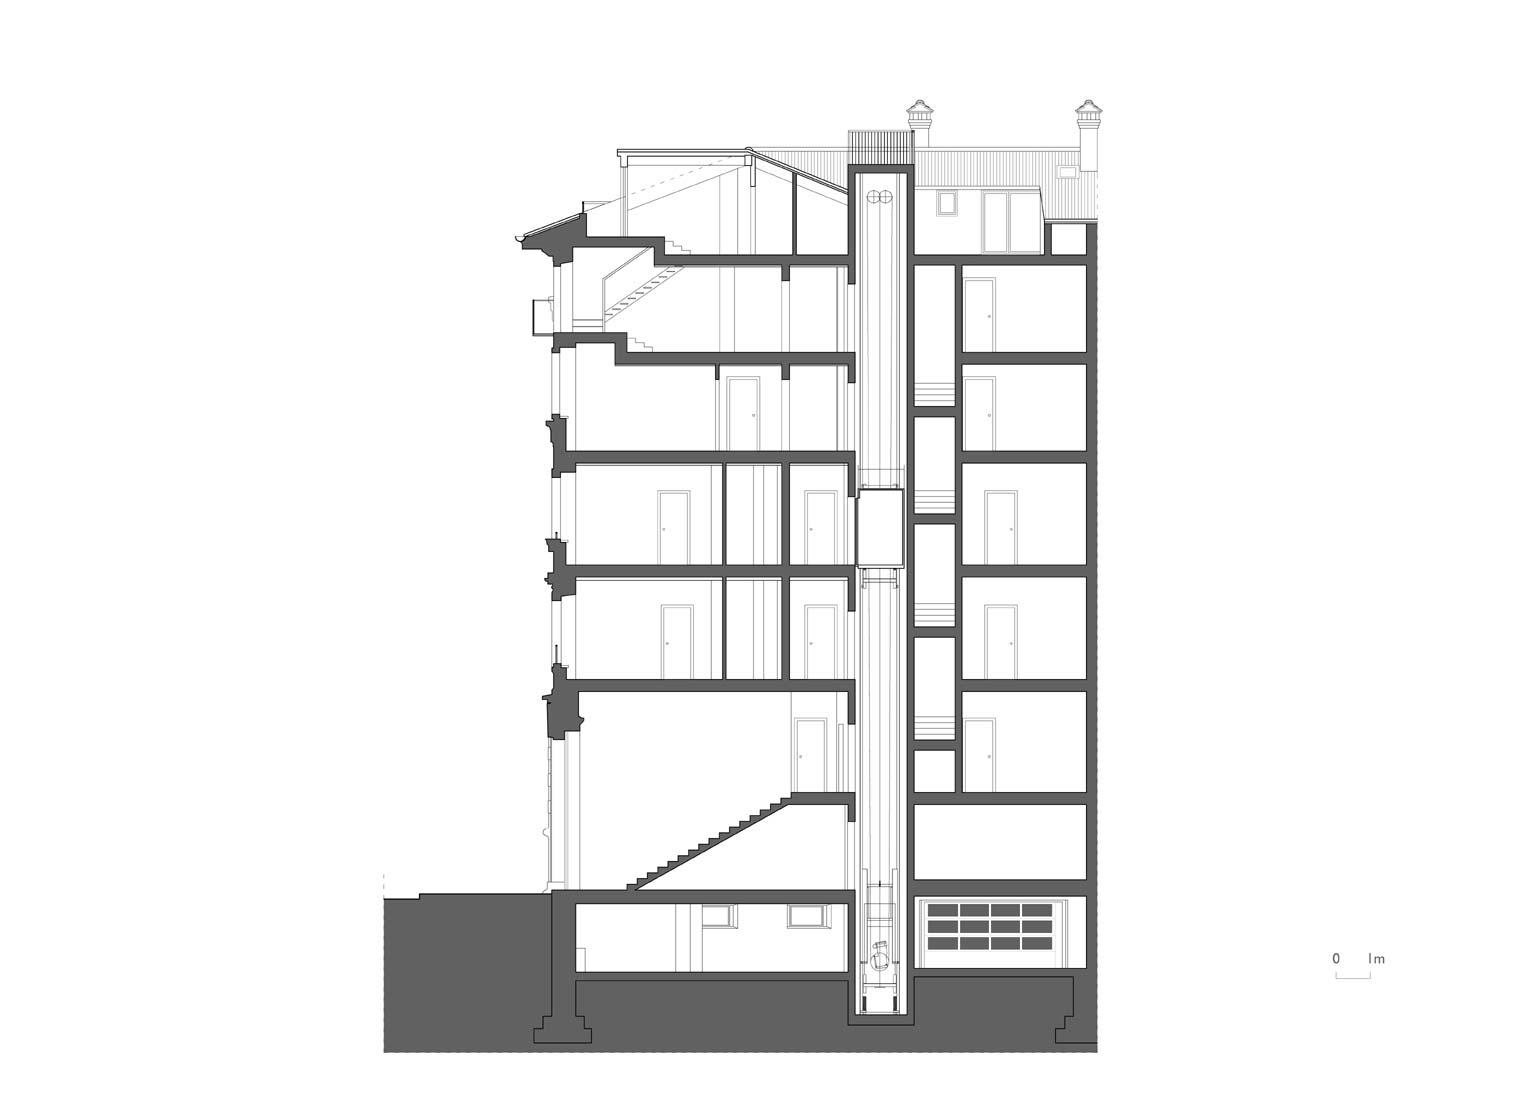 vk-architetti_galilei3_24